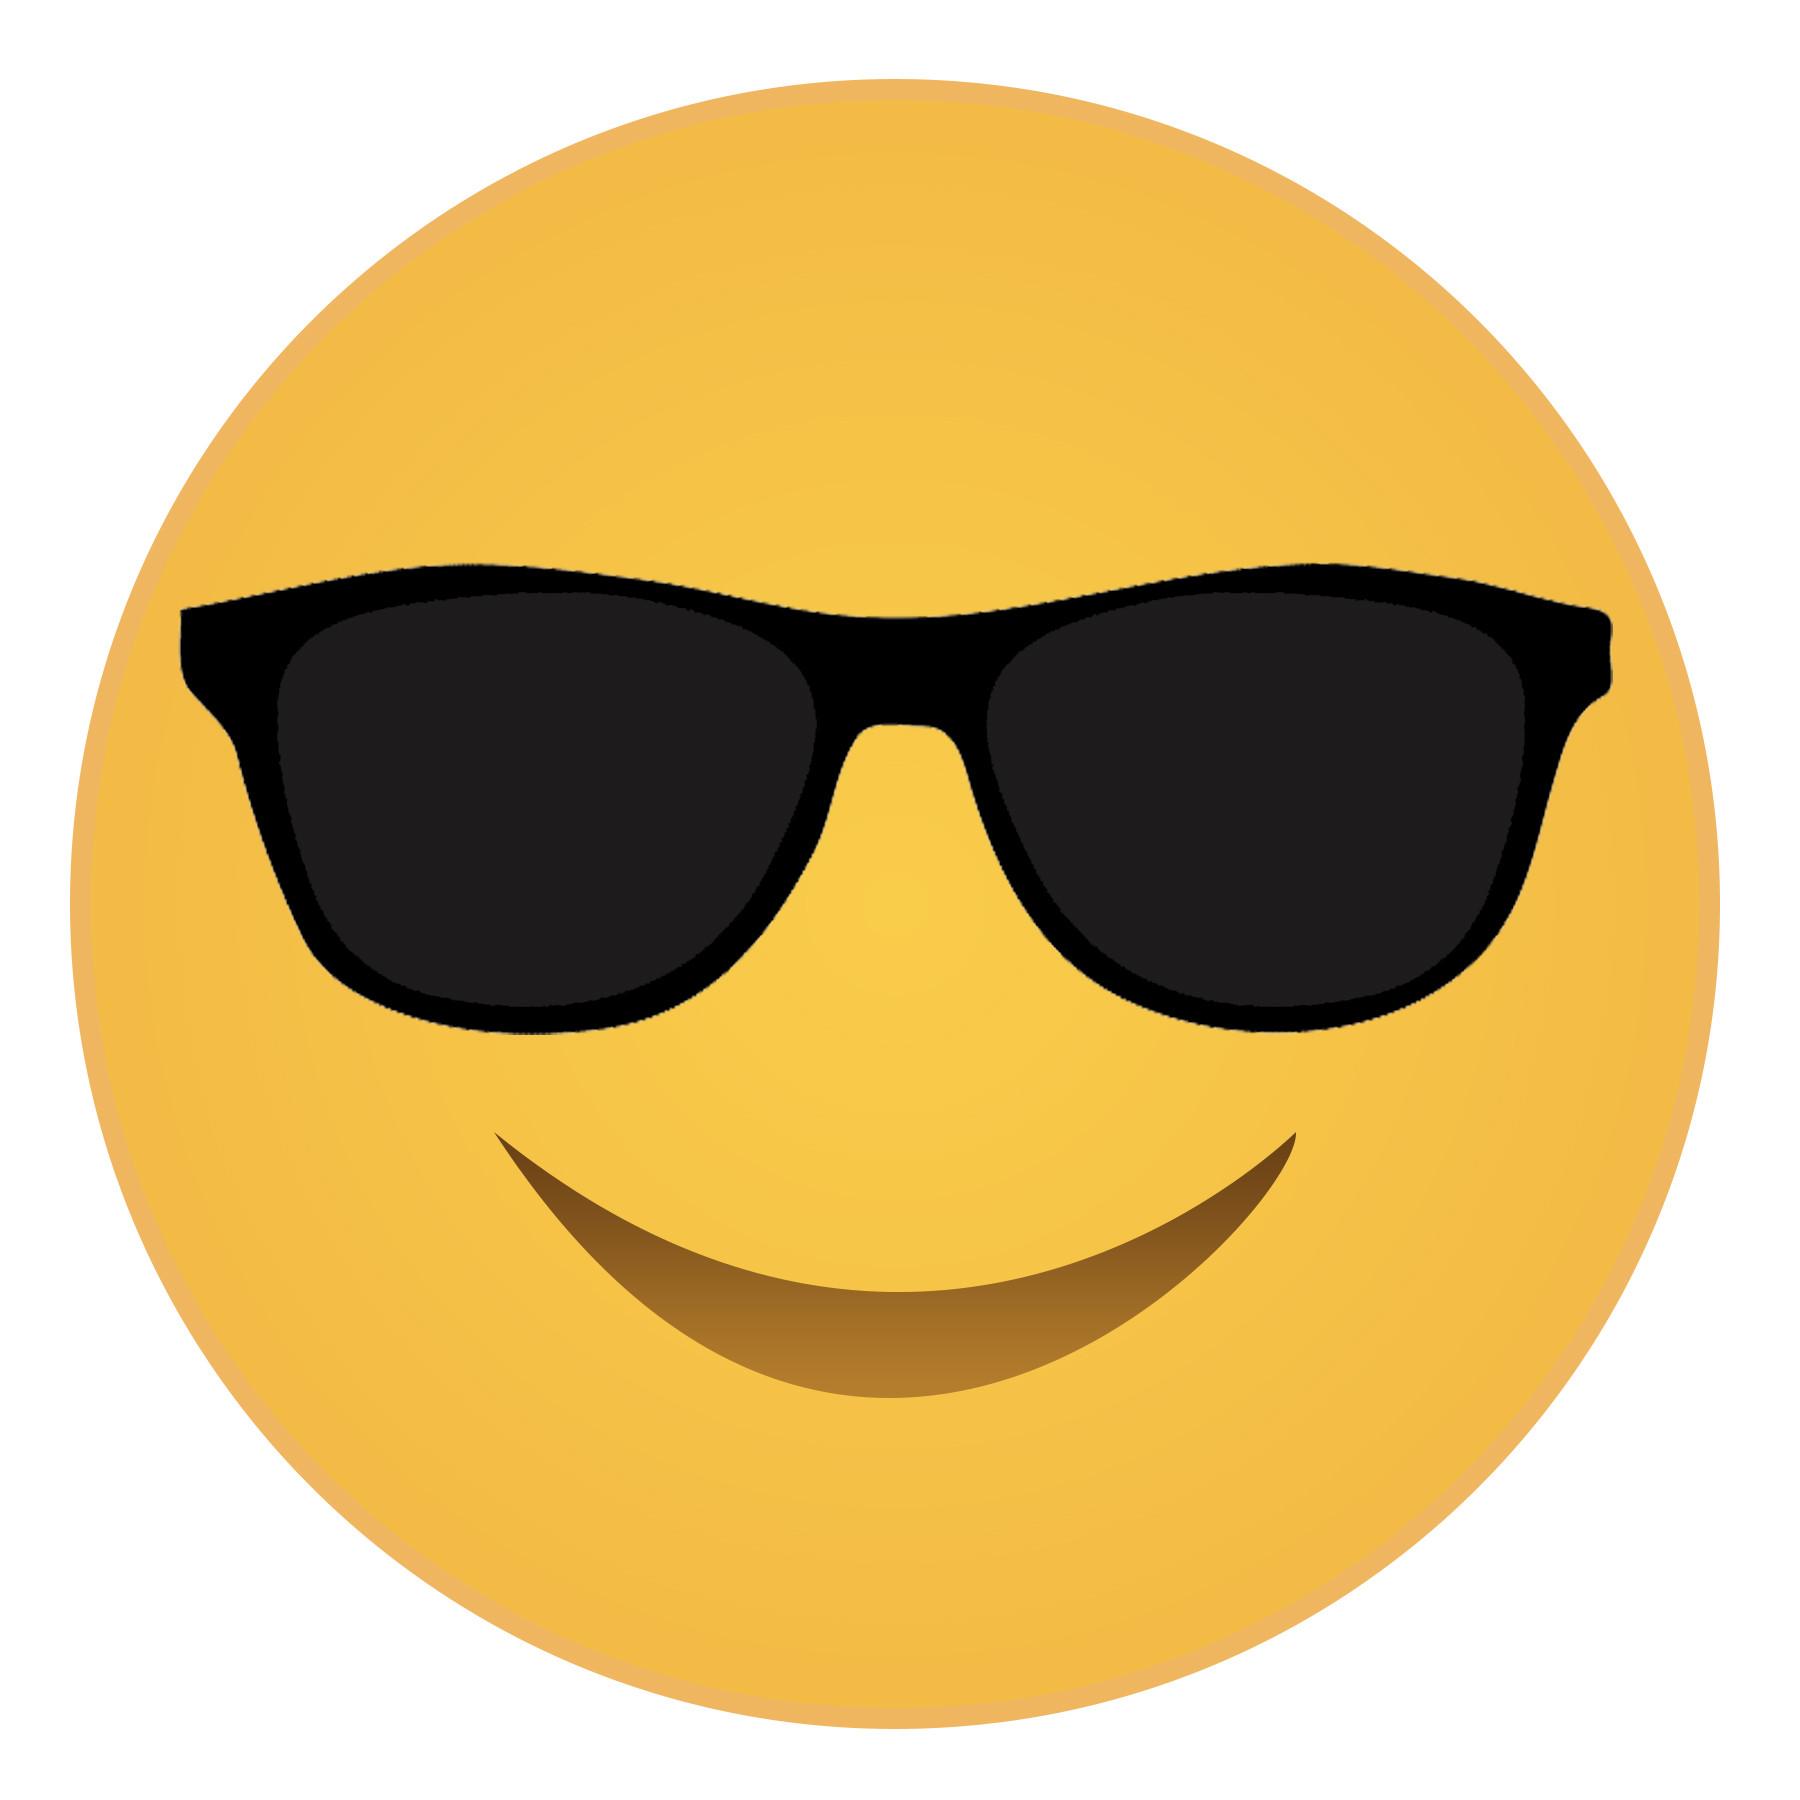 emoji faces clipart at getdrawings com free for personal use emoji rh getdrawings com Thank You Smiley Face Clip Art Thank You Smiley Face Clip Art